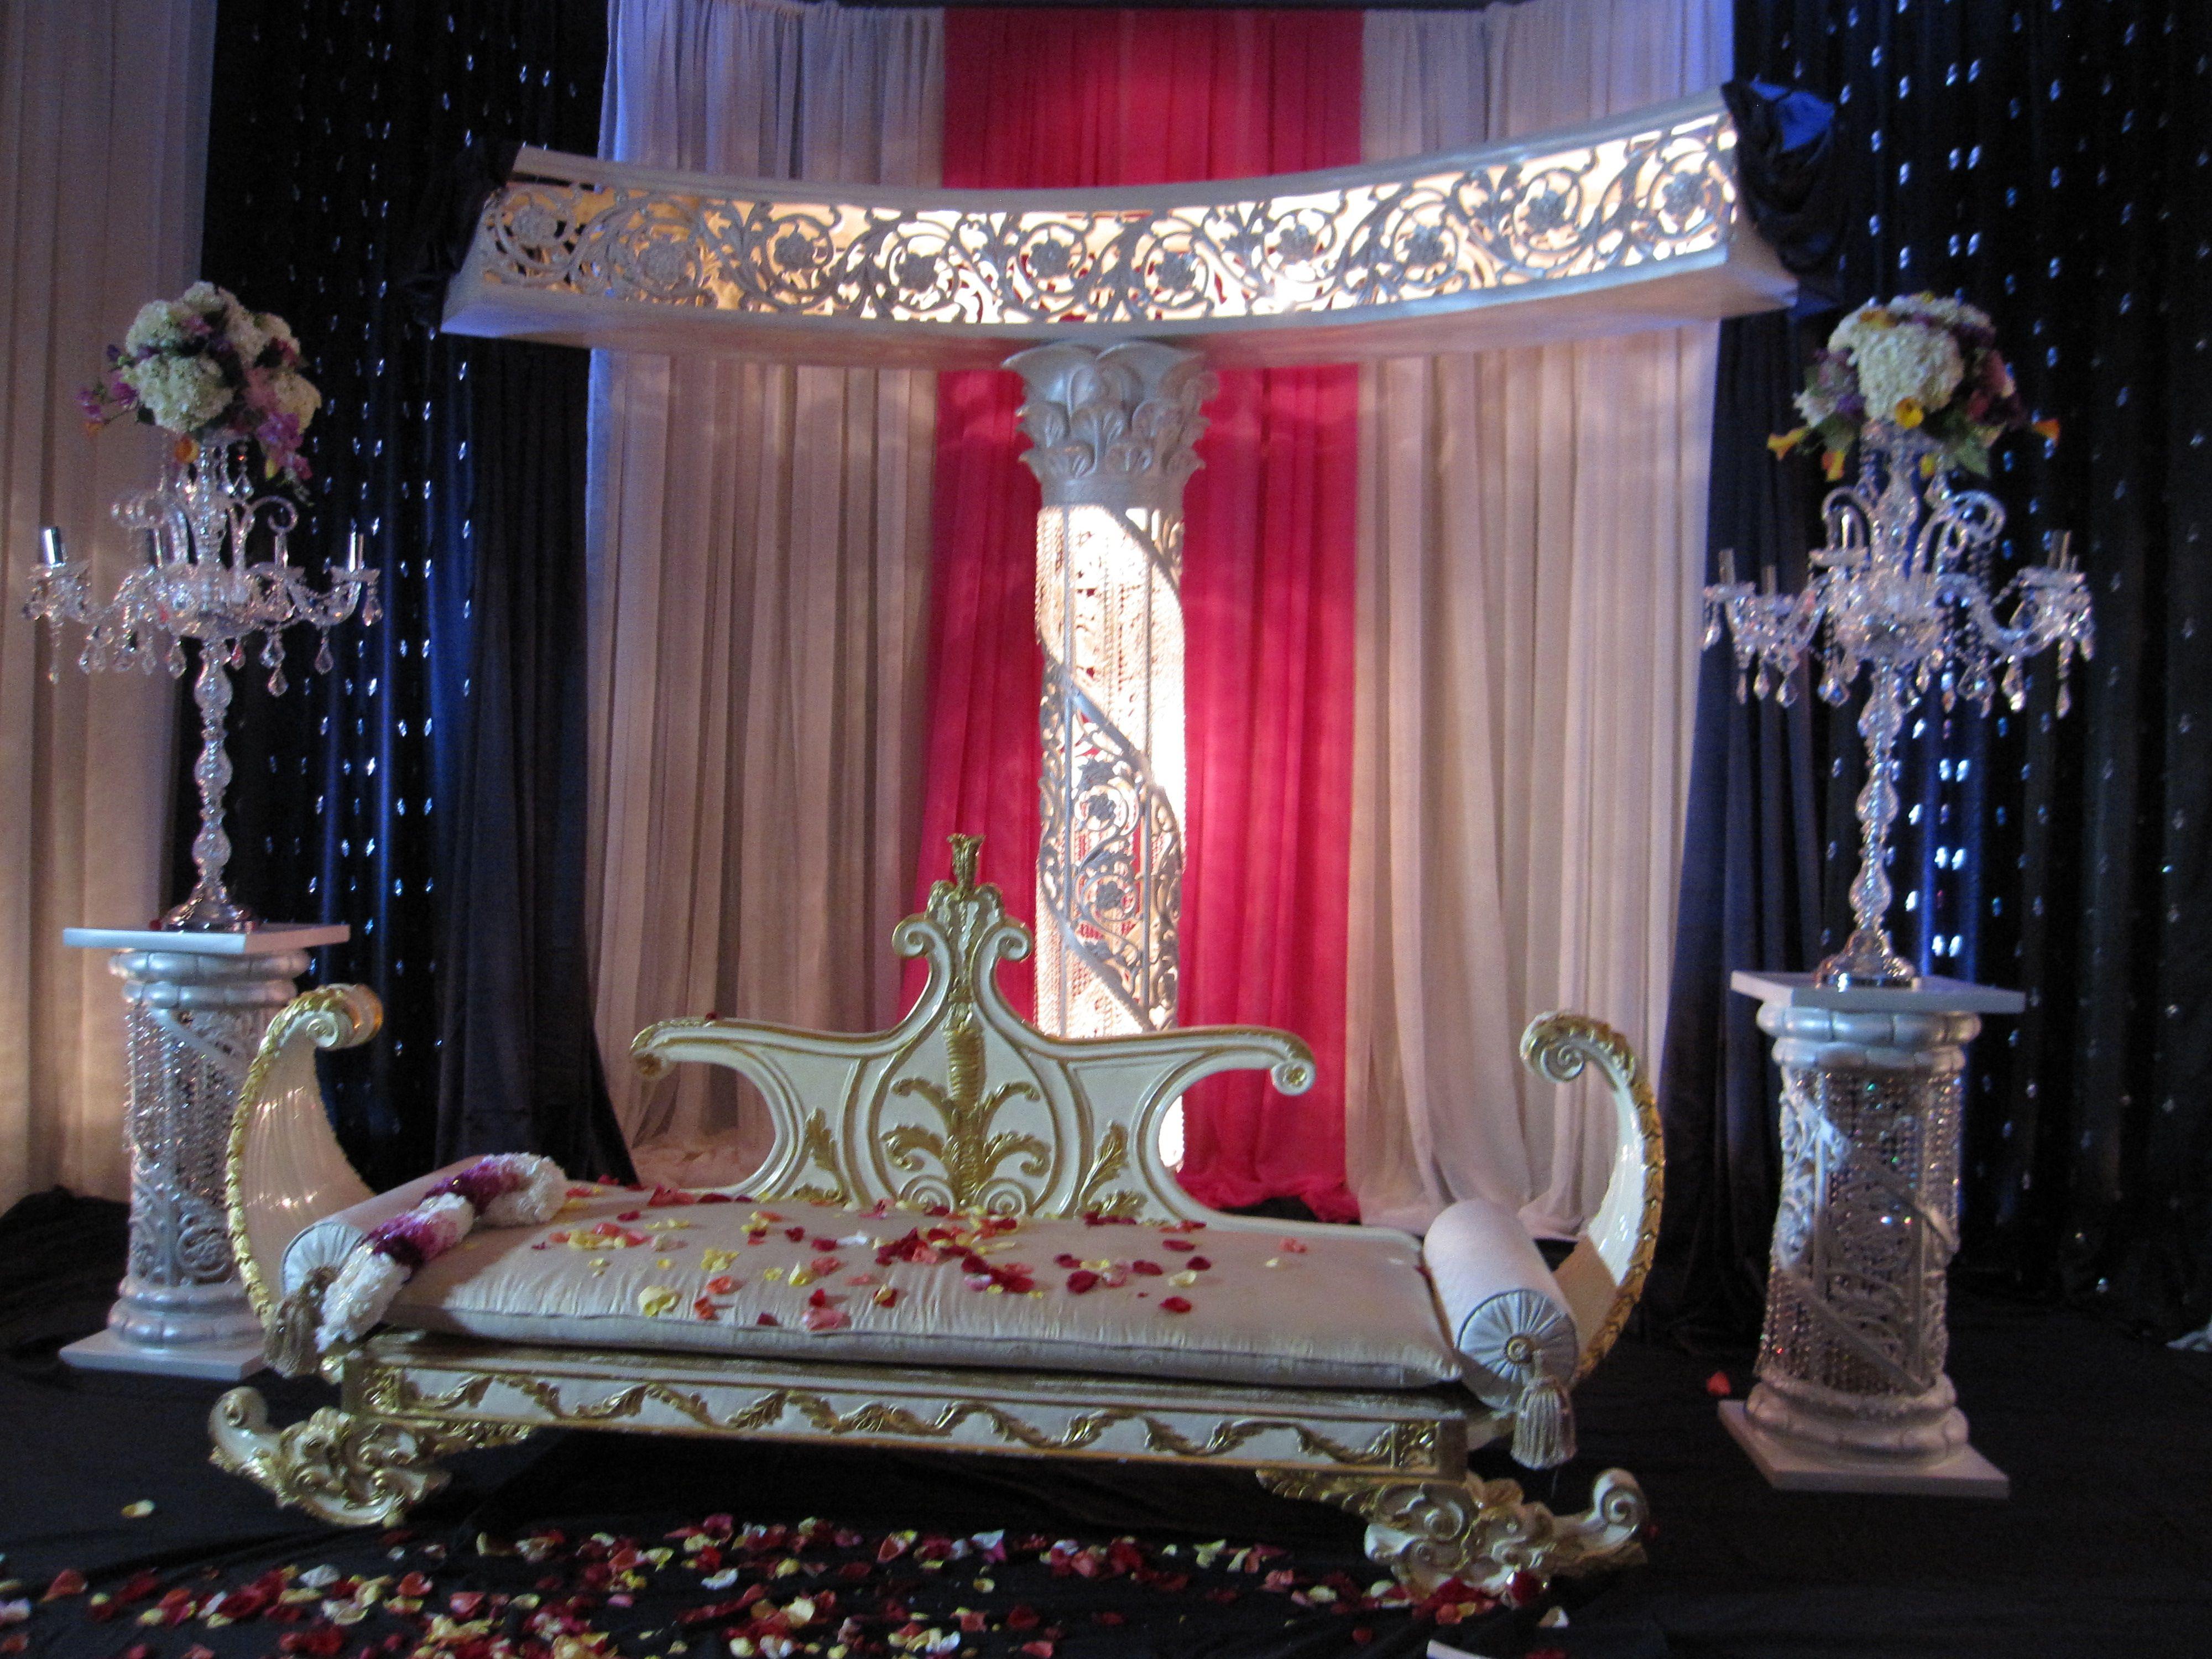 The Hilton Suites Markham Ballroom Weddings By Sultana Wedding